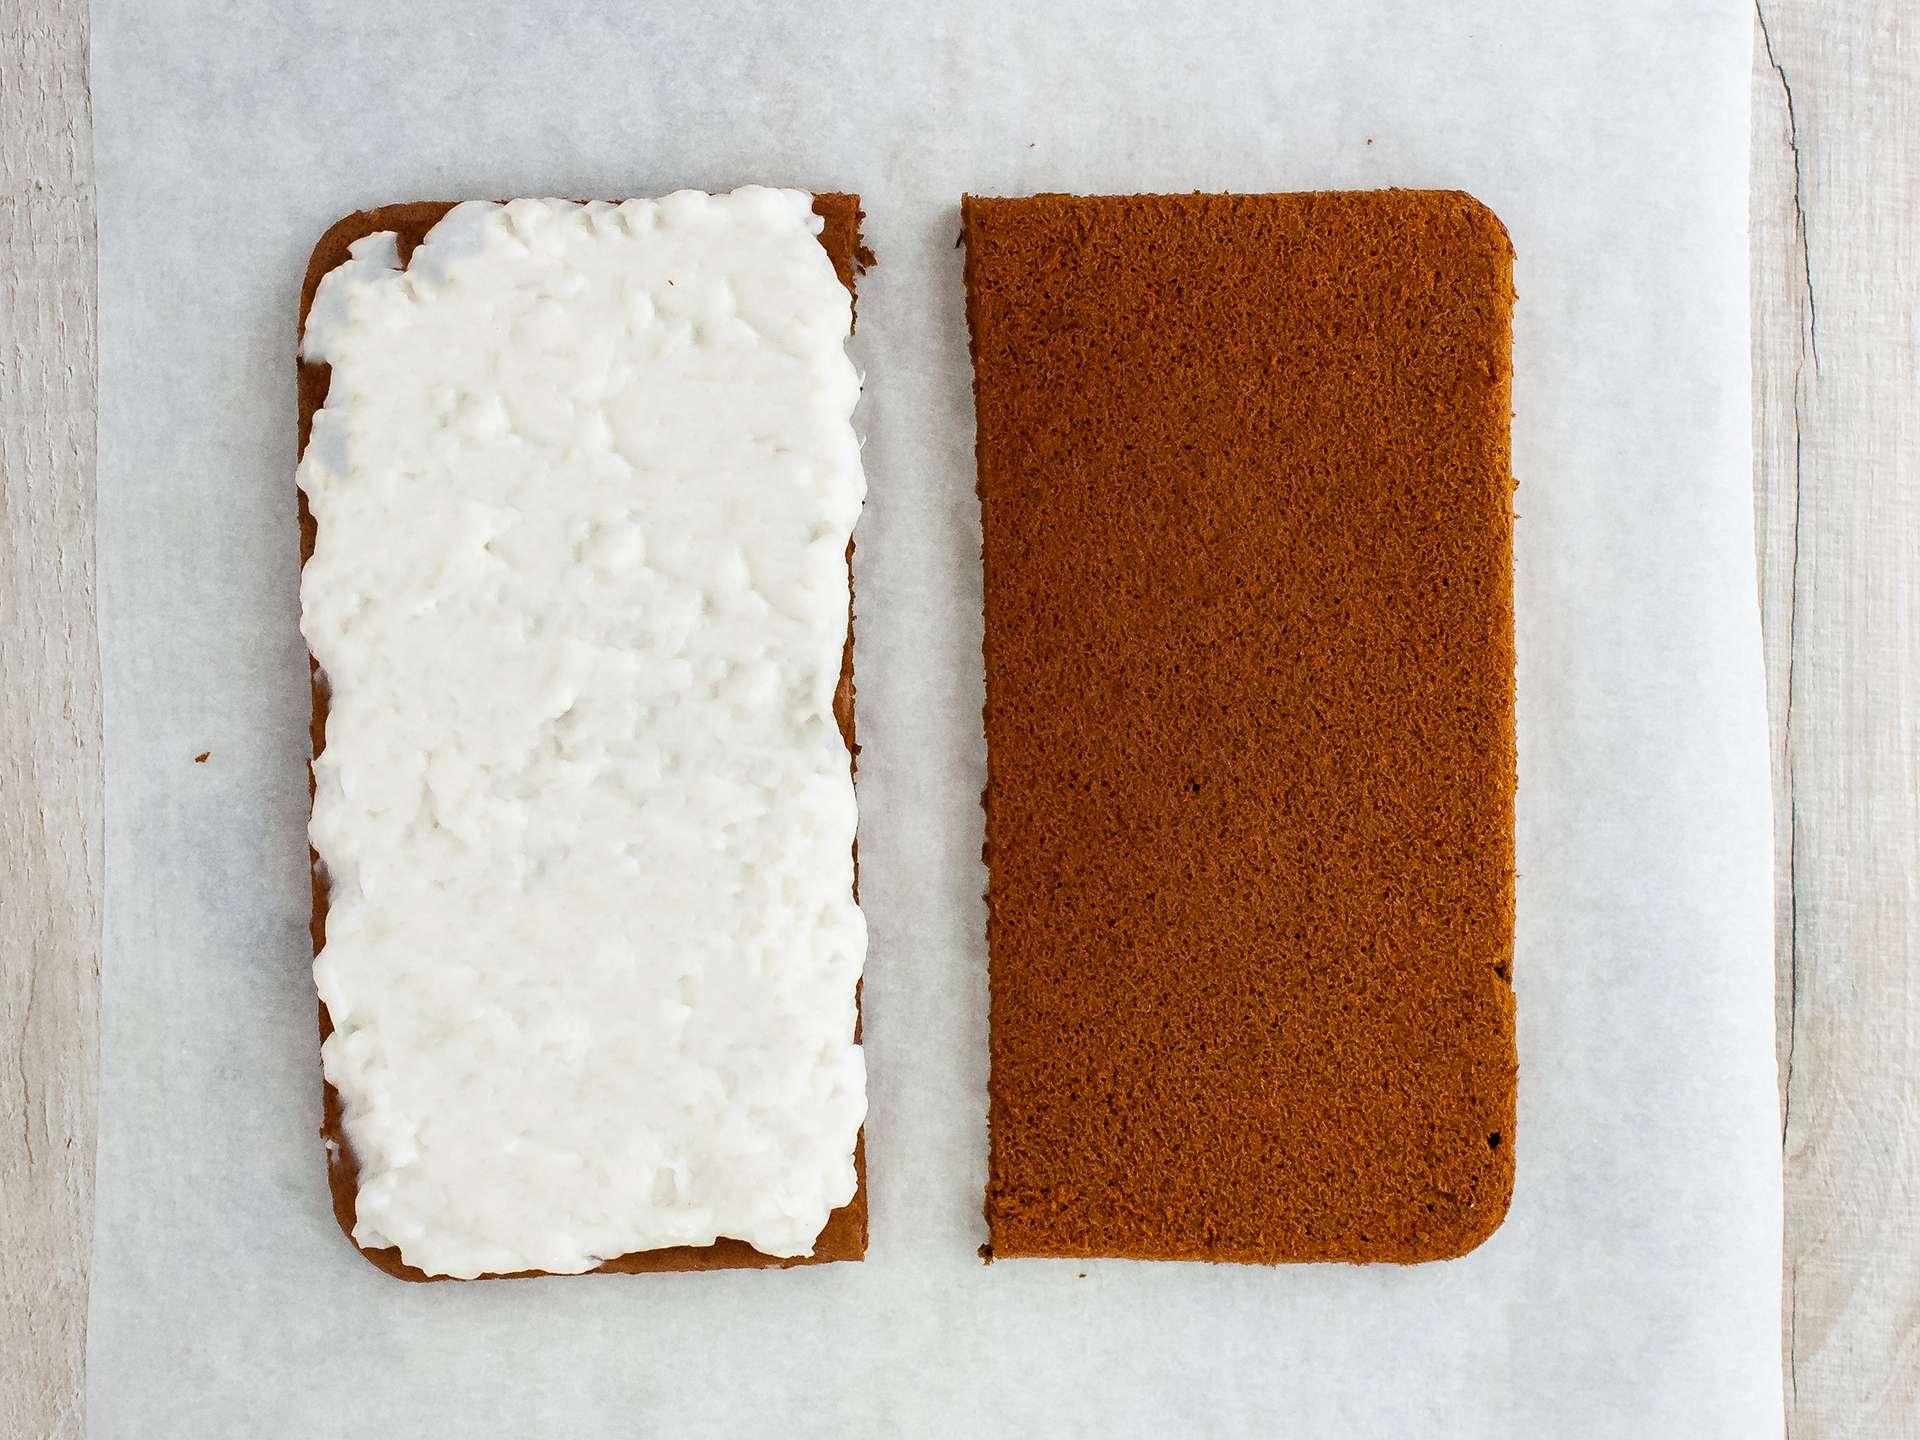 Step 4.1 of Dairy Free Chocolate Sandwich Cake Bar